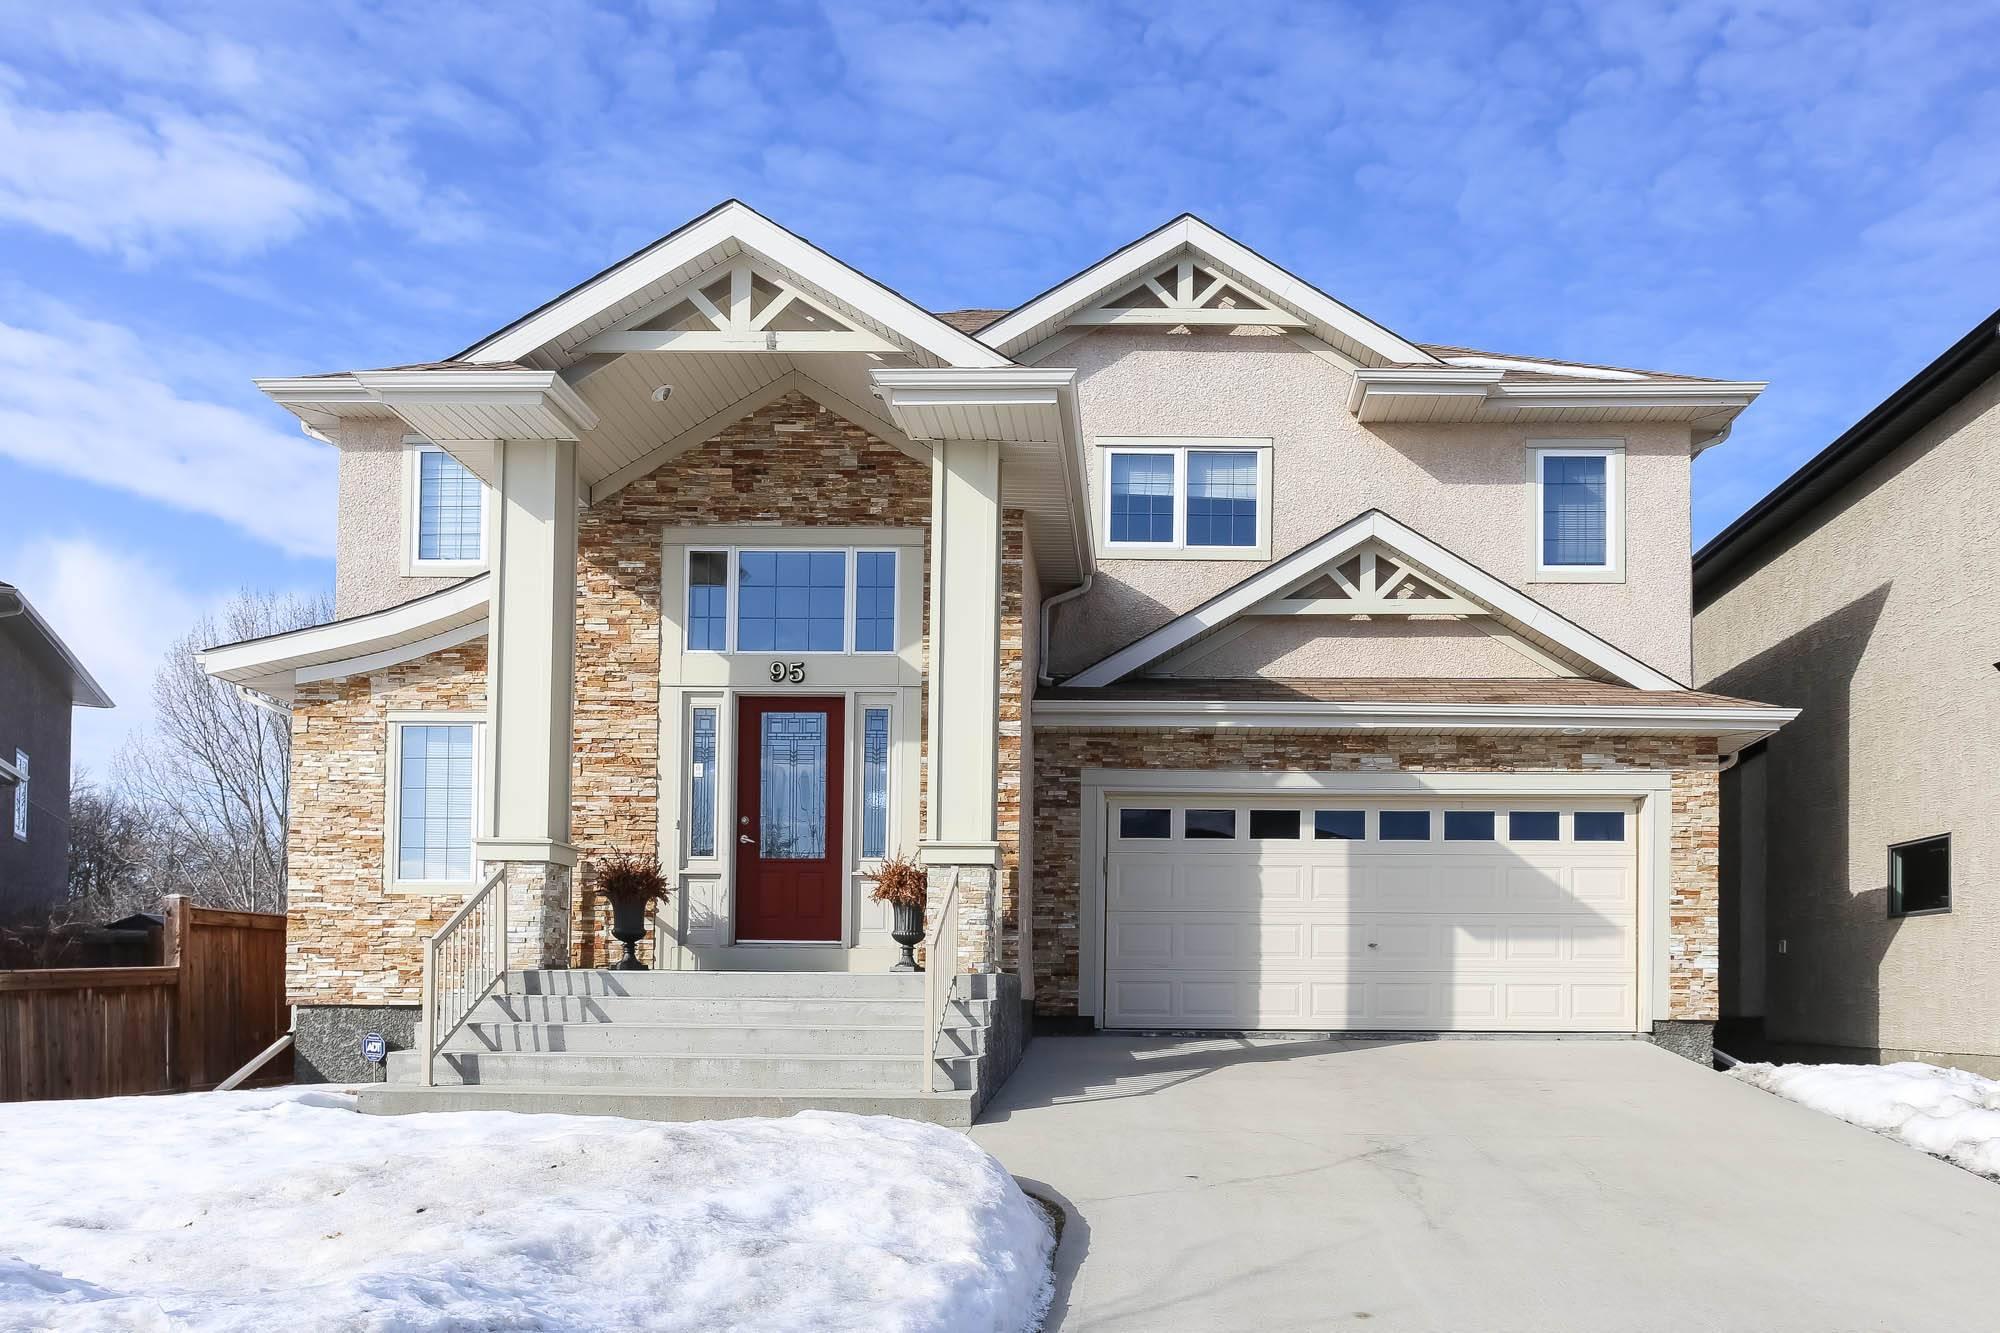 95 Portside Drive, Winnipeg, Manitoba  R2N 0C8 - Photo 37 - 202004300